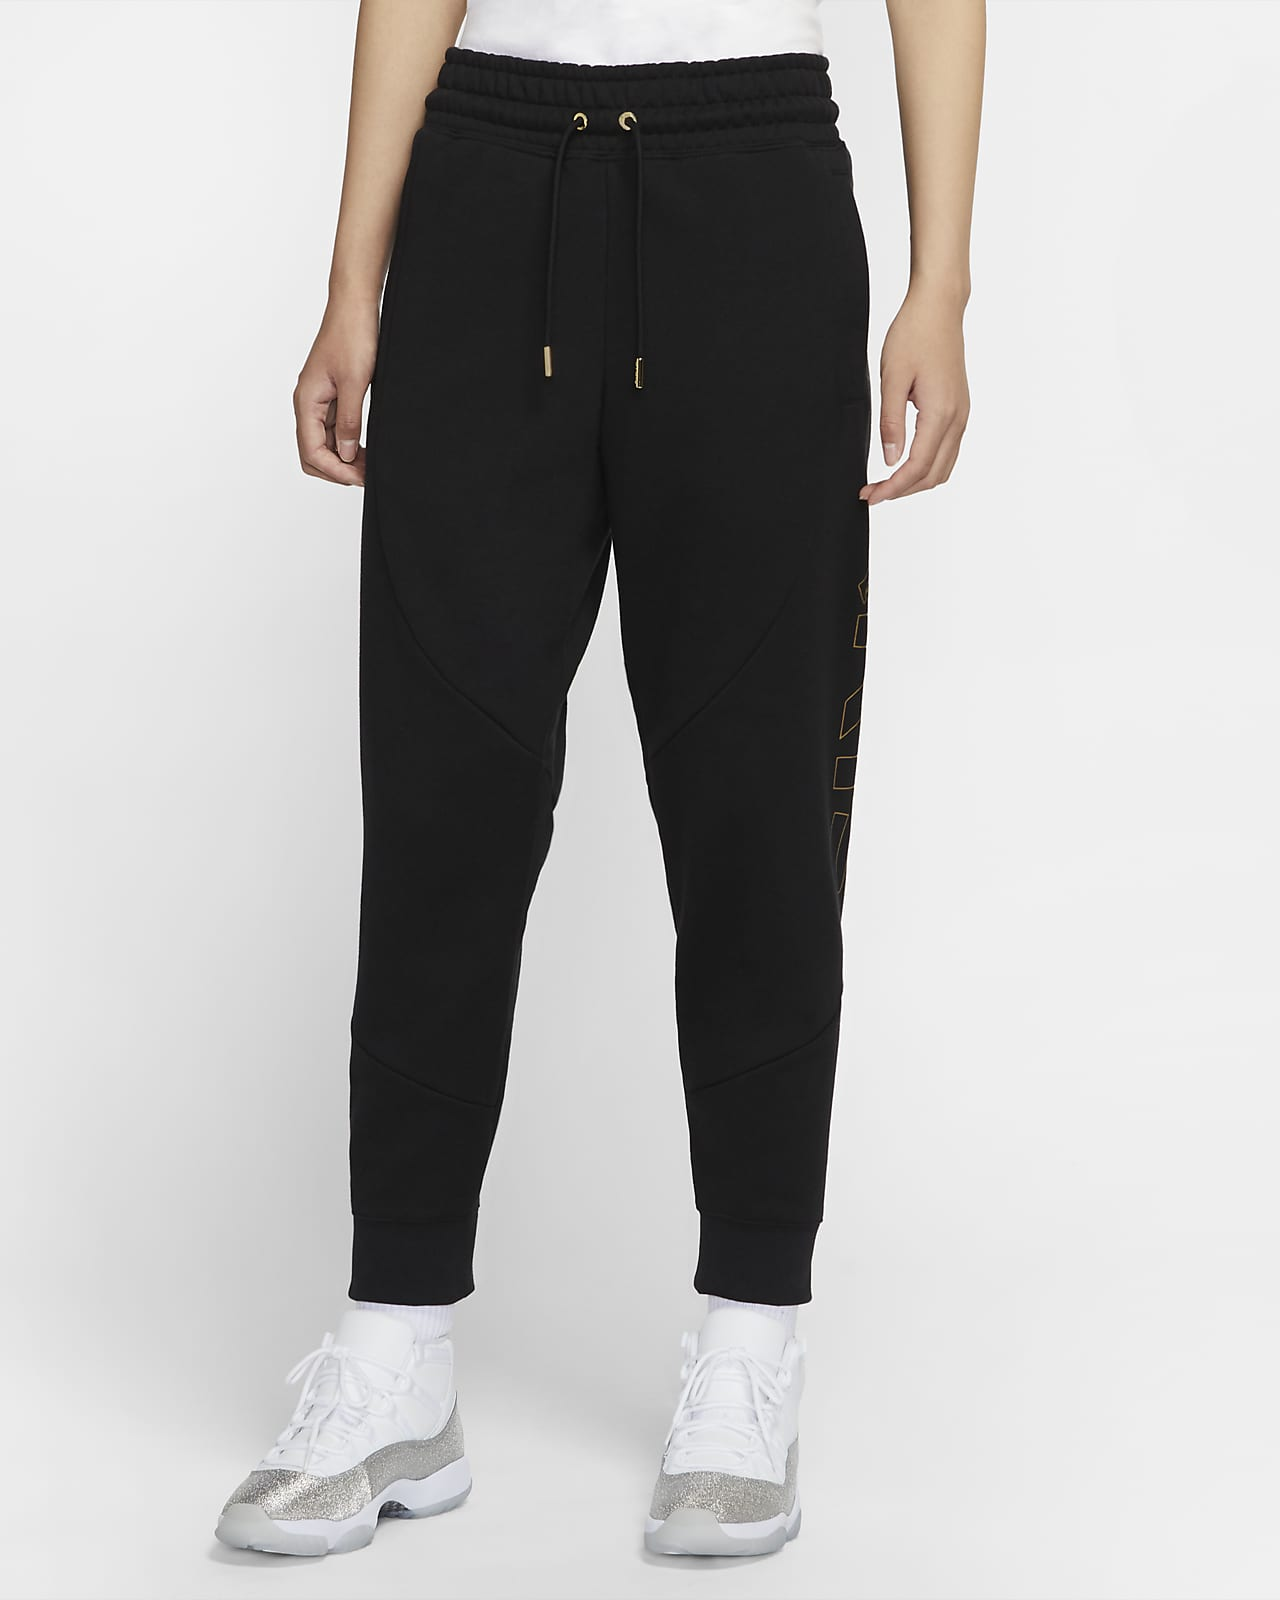 Pantalones de tejido Fleece para mujer Paris Saint-Germain